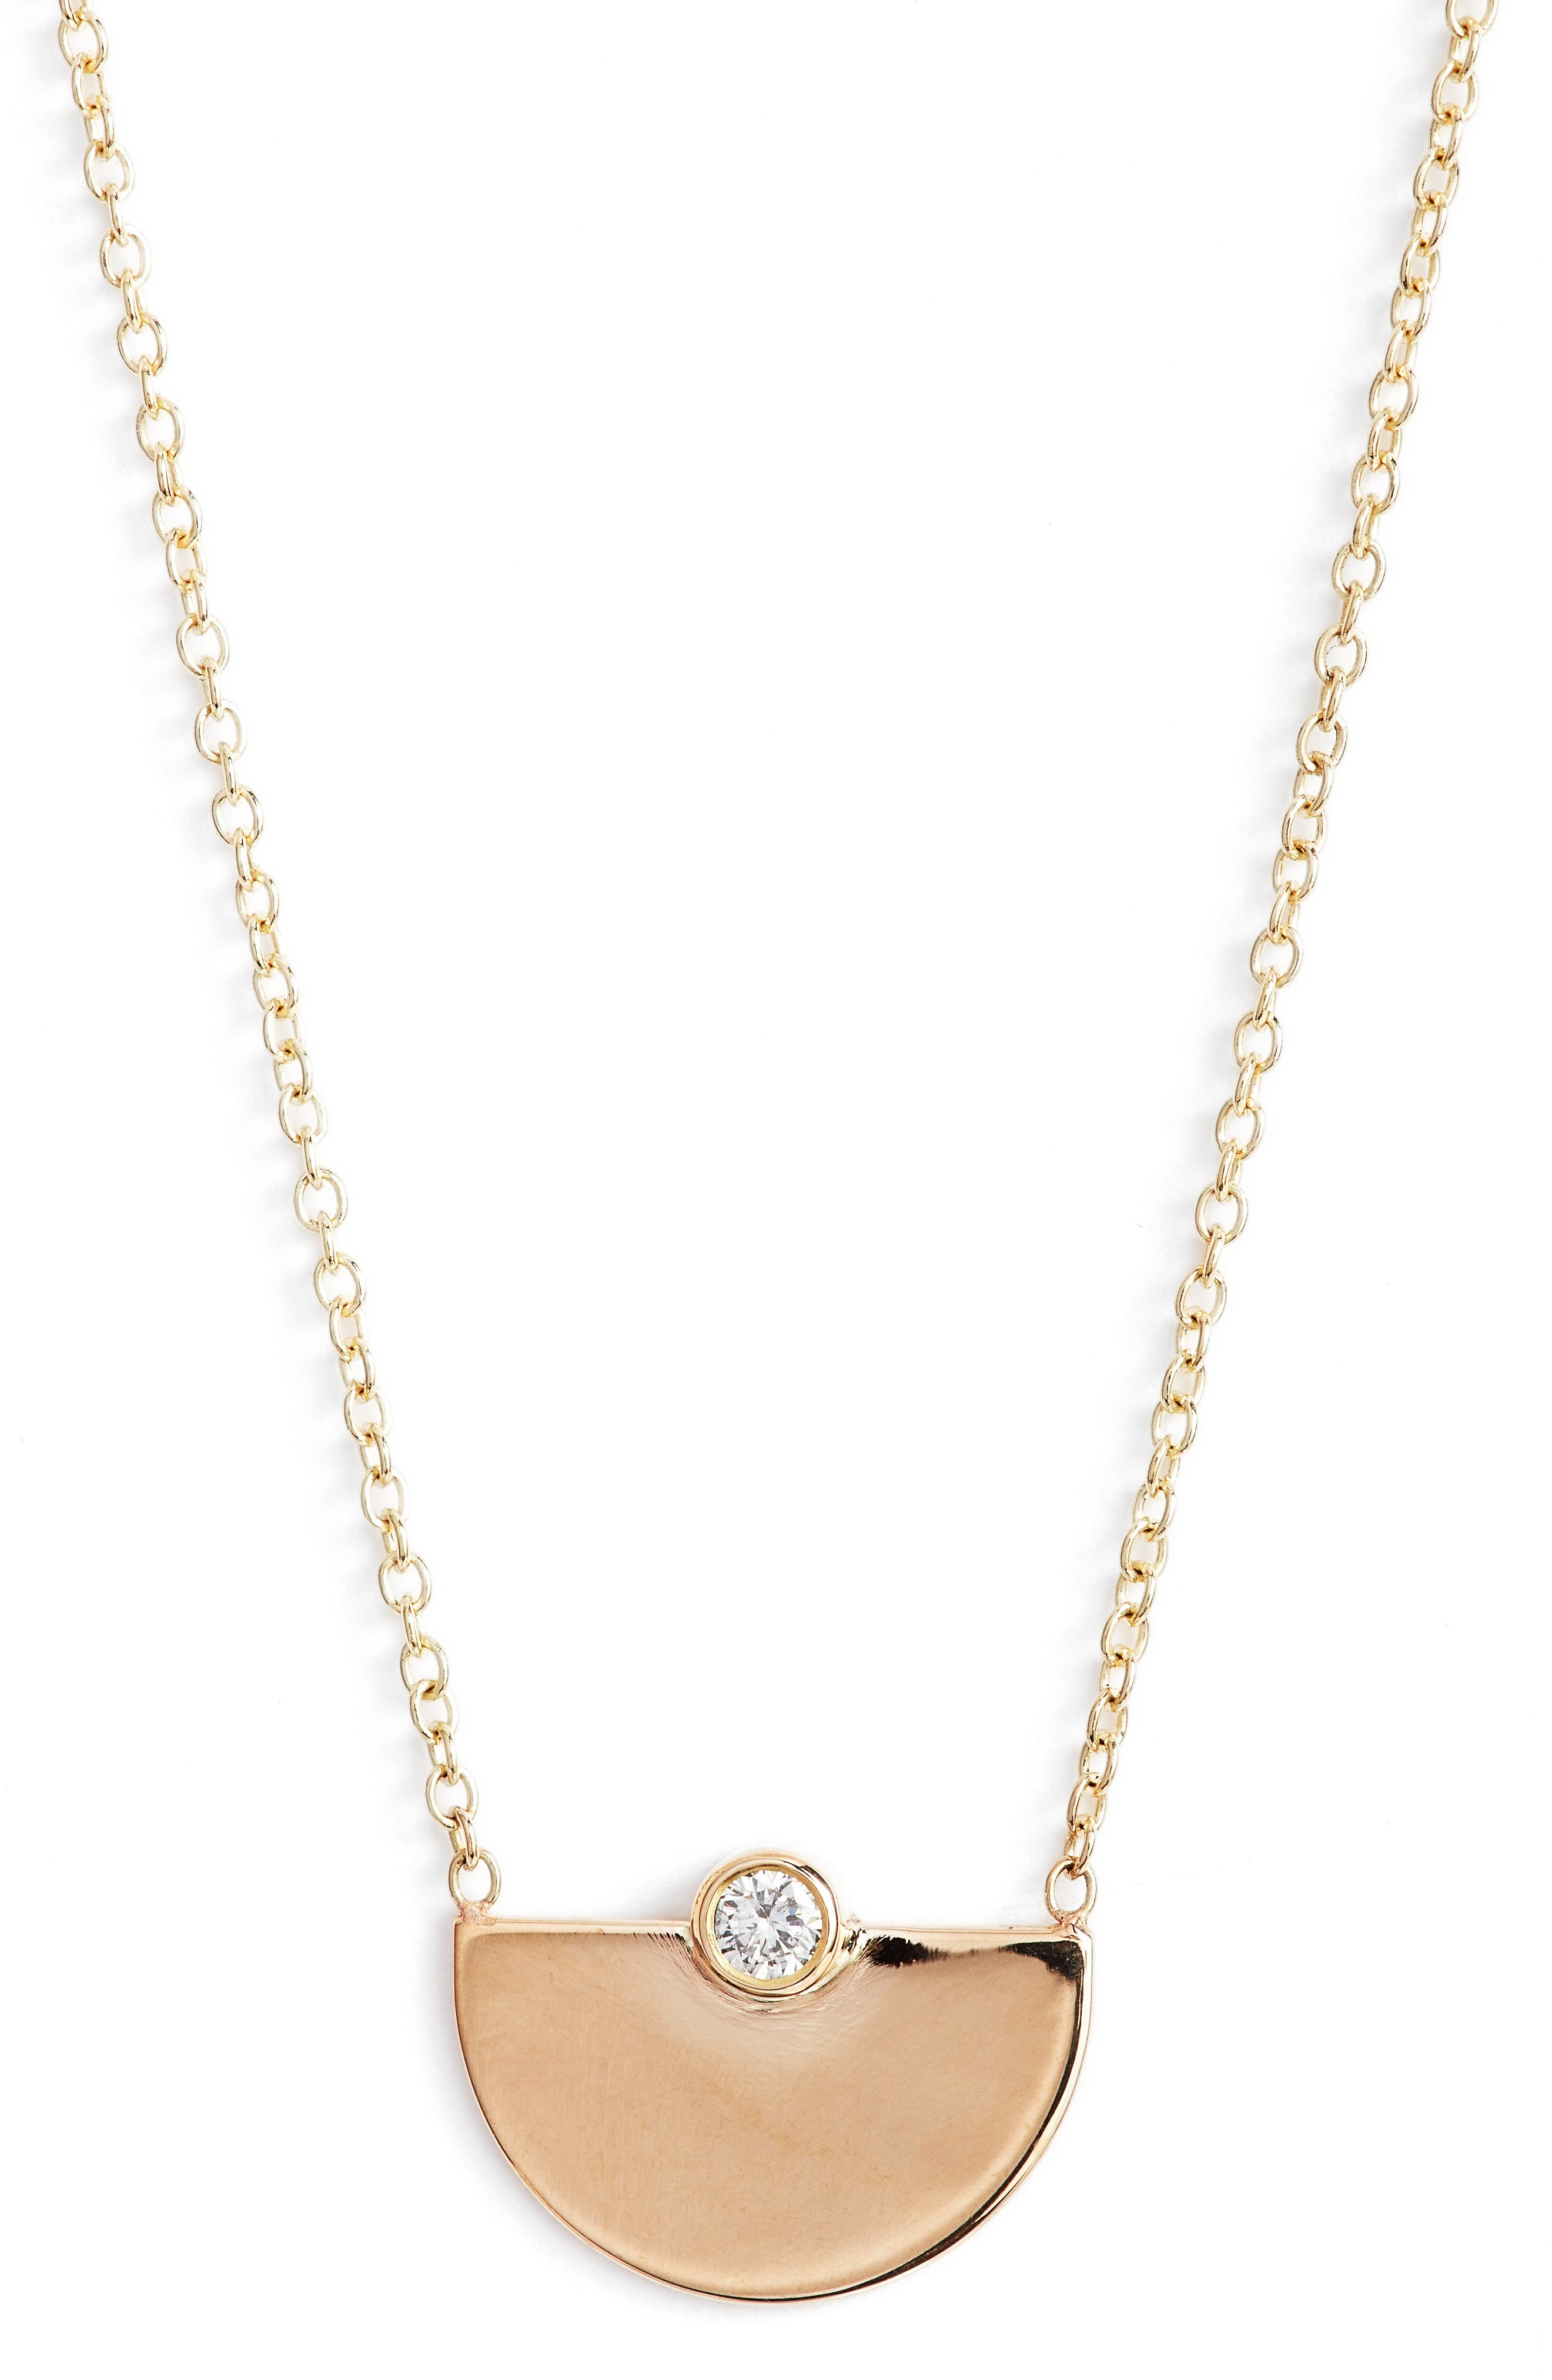 Horizon Diamond Pendant Necklace,                             Main thumbnail 1, color,                             YELLOW GOLD